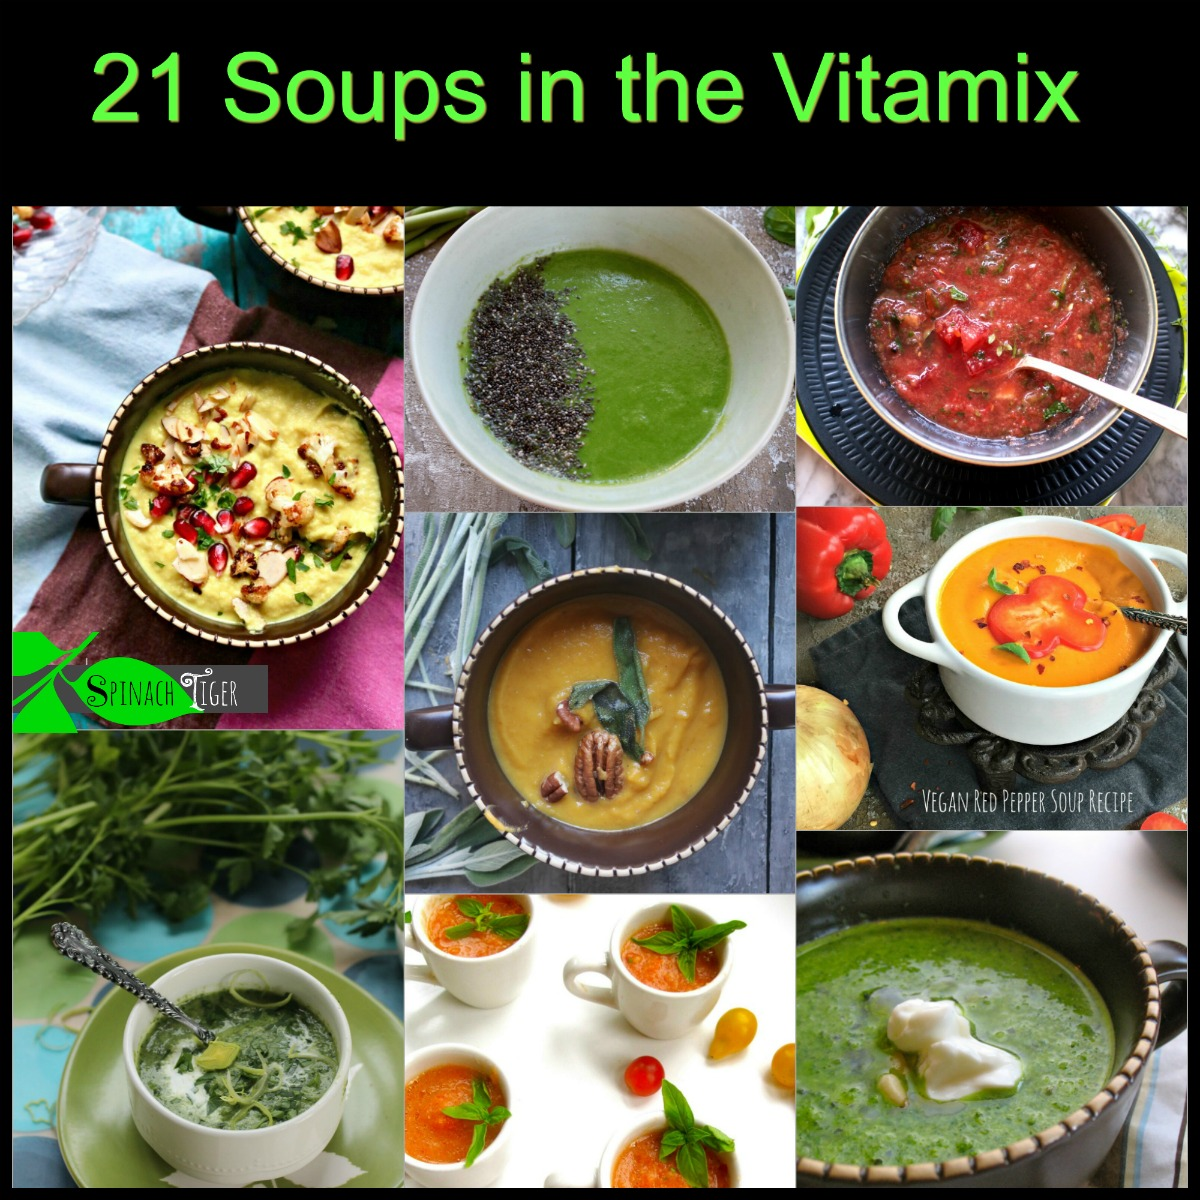 Vitamix Soup Recipes Made in Minutes via @angelaroberts